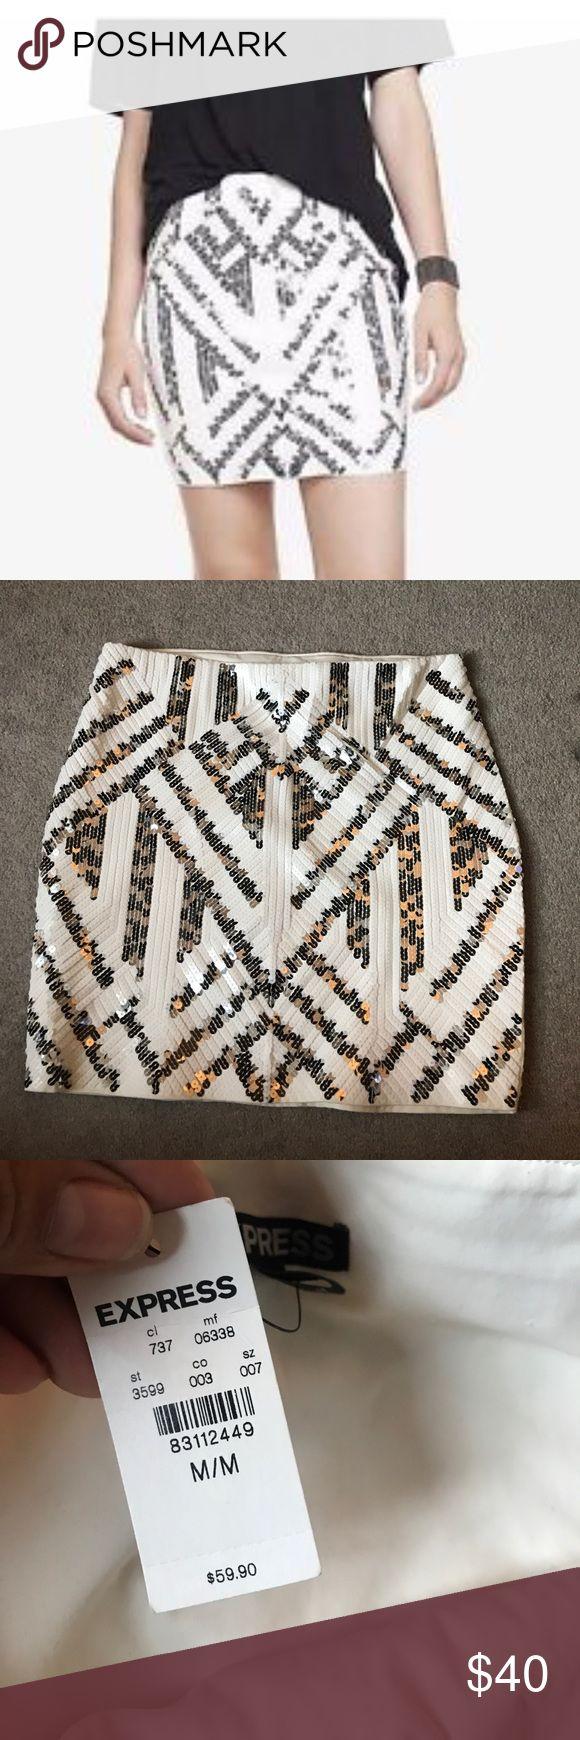 Express white aztec mini skirt Mini white aztec sequin skirt. Never worn, really cute and flattering! Express Skirts Mini